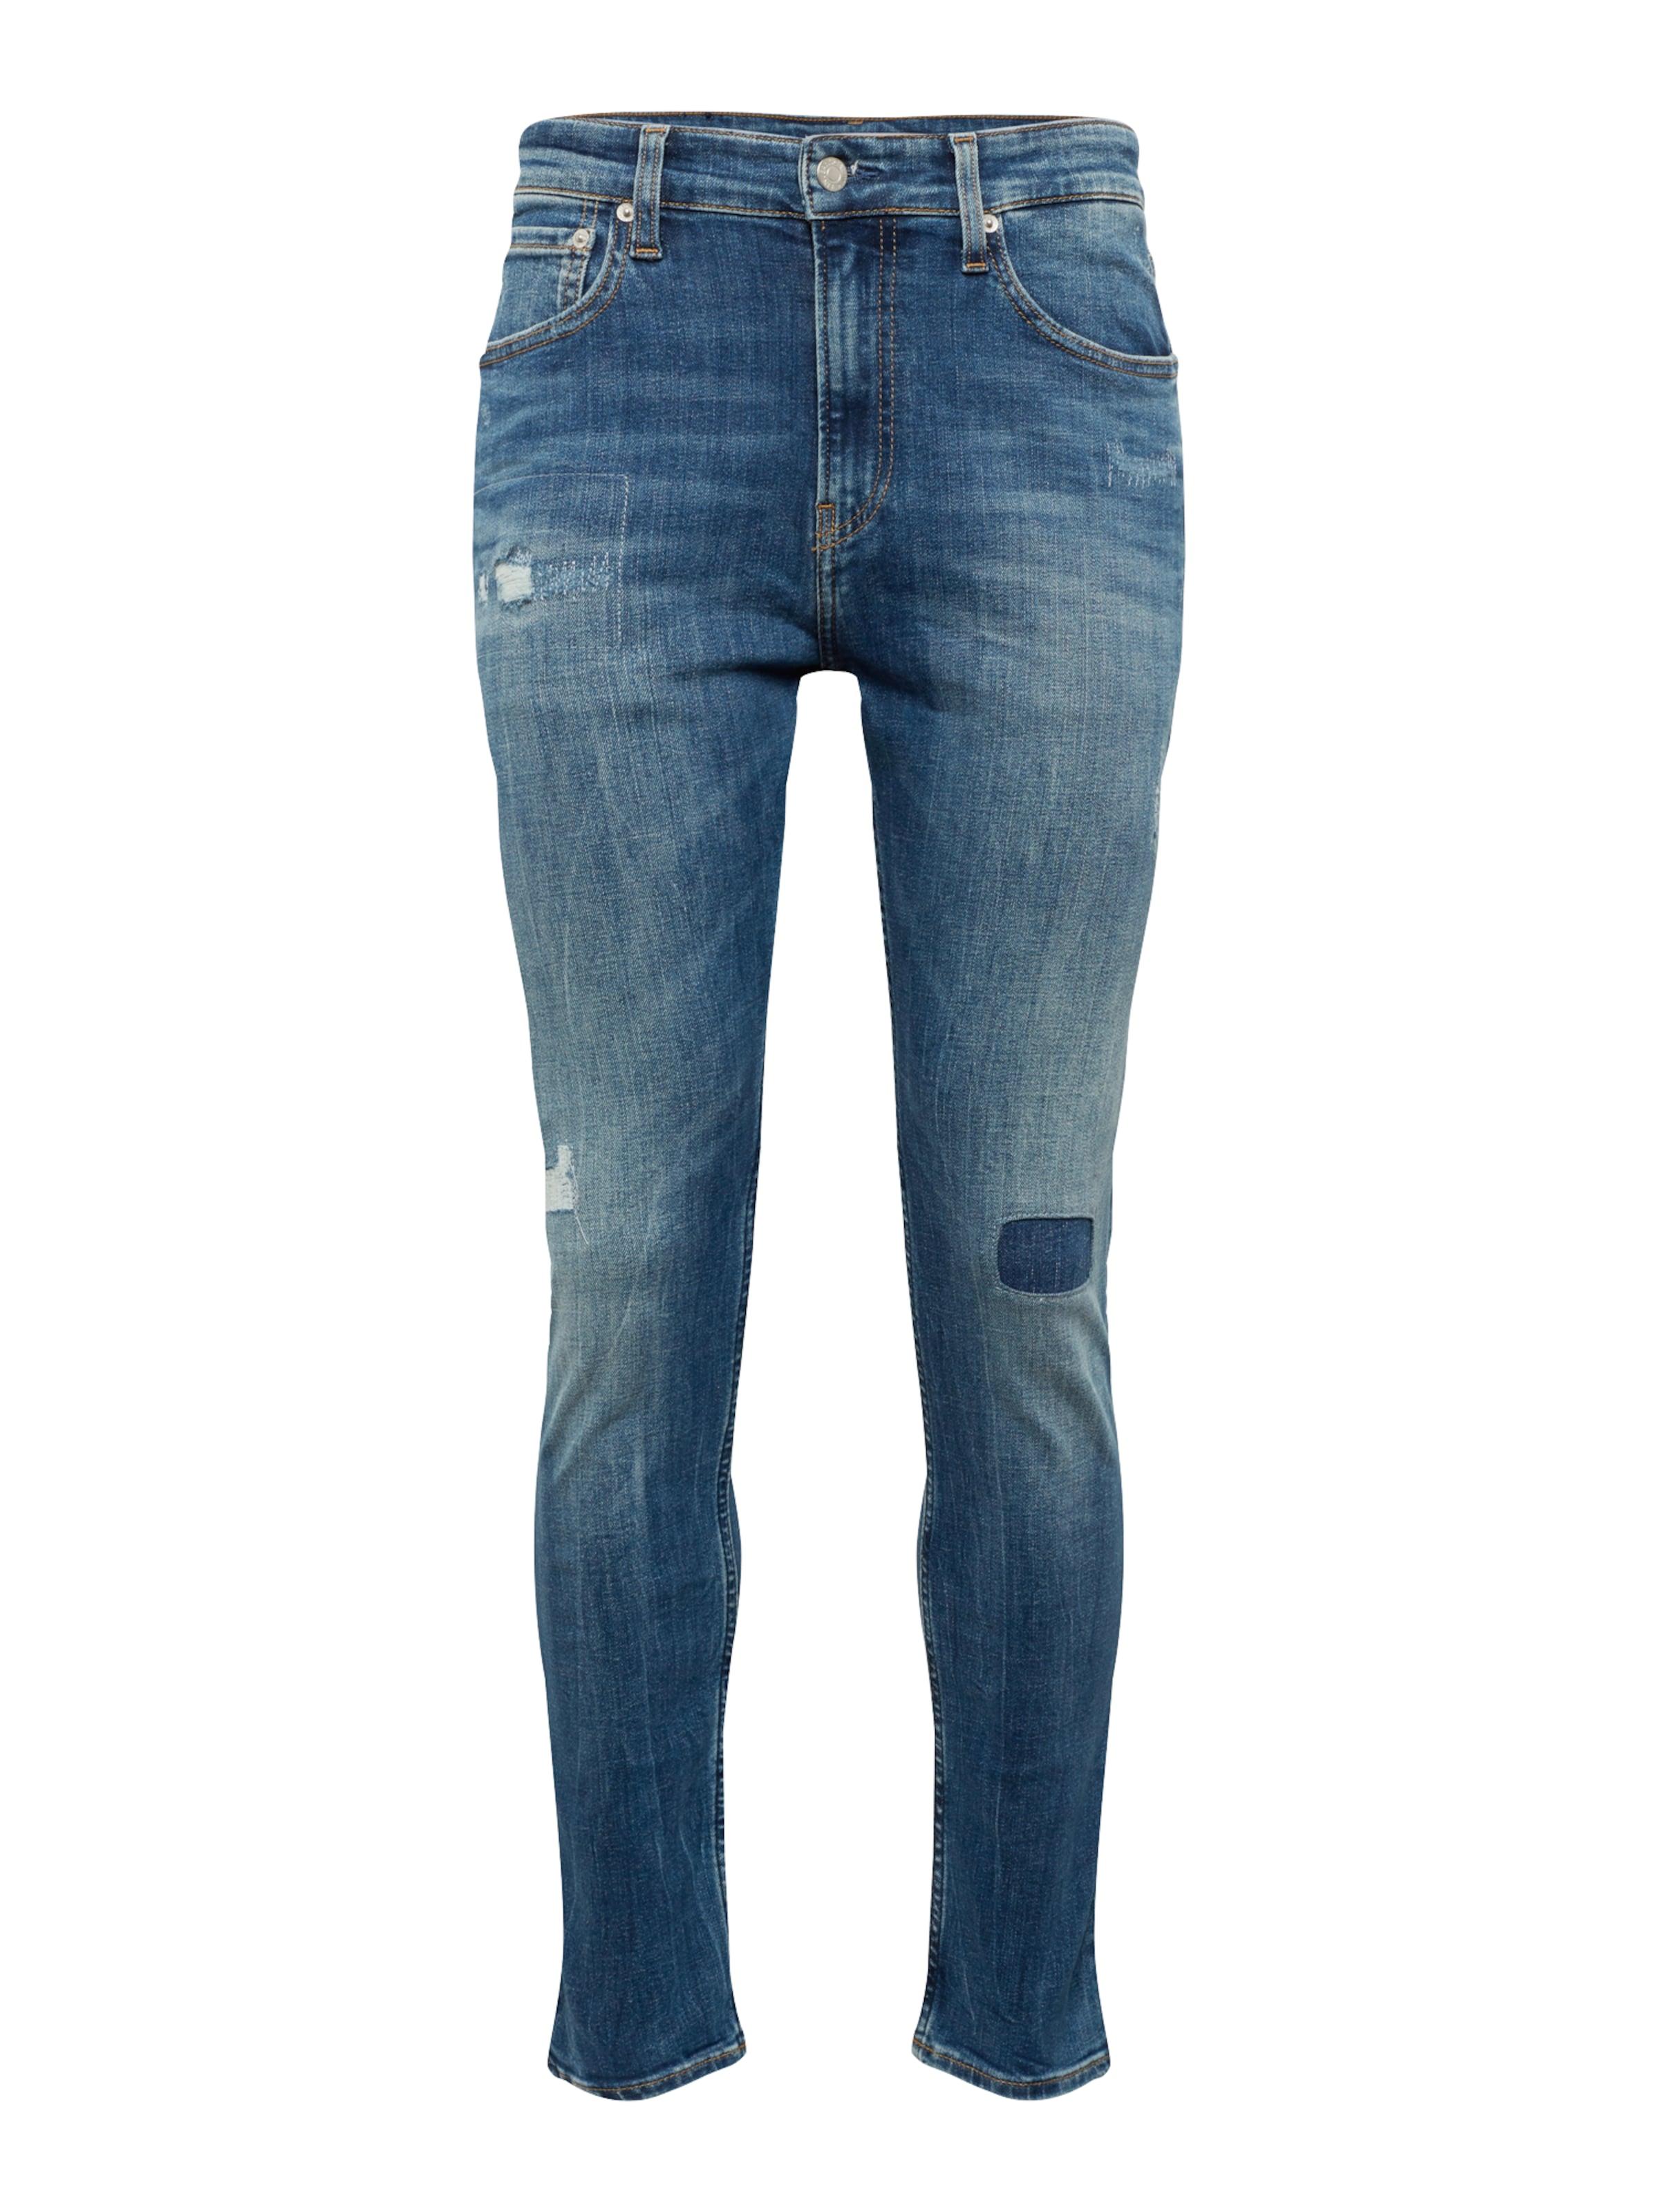 Jeans Skinny' In Calvin Blue Denim 016 Klein 'ckj rdoeBCx